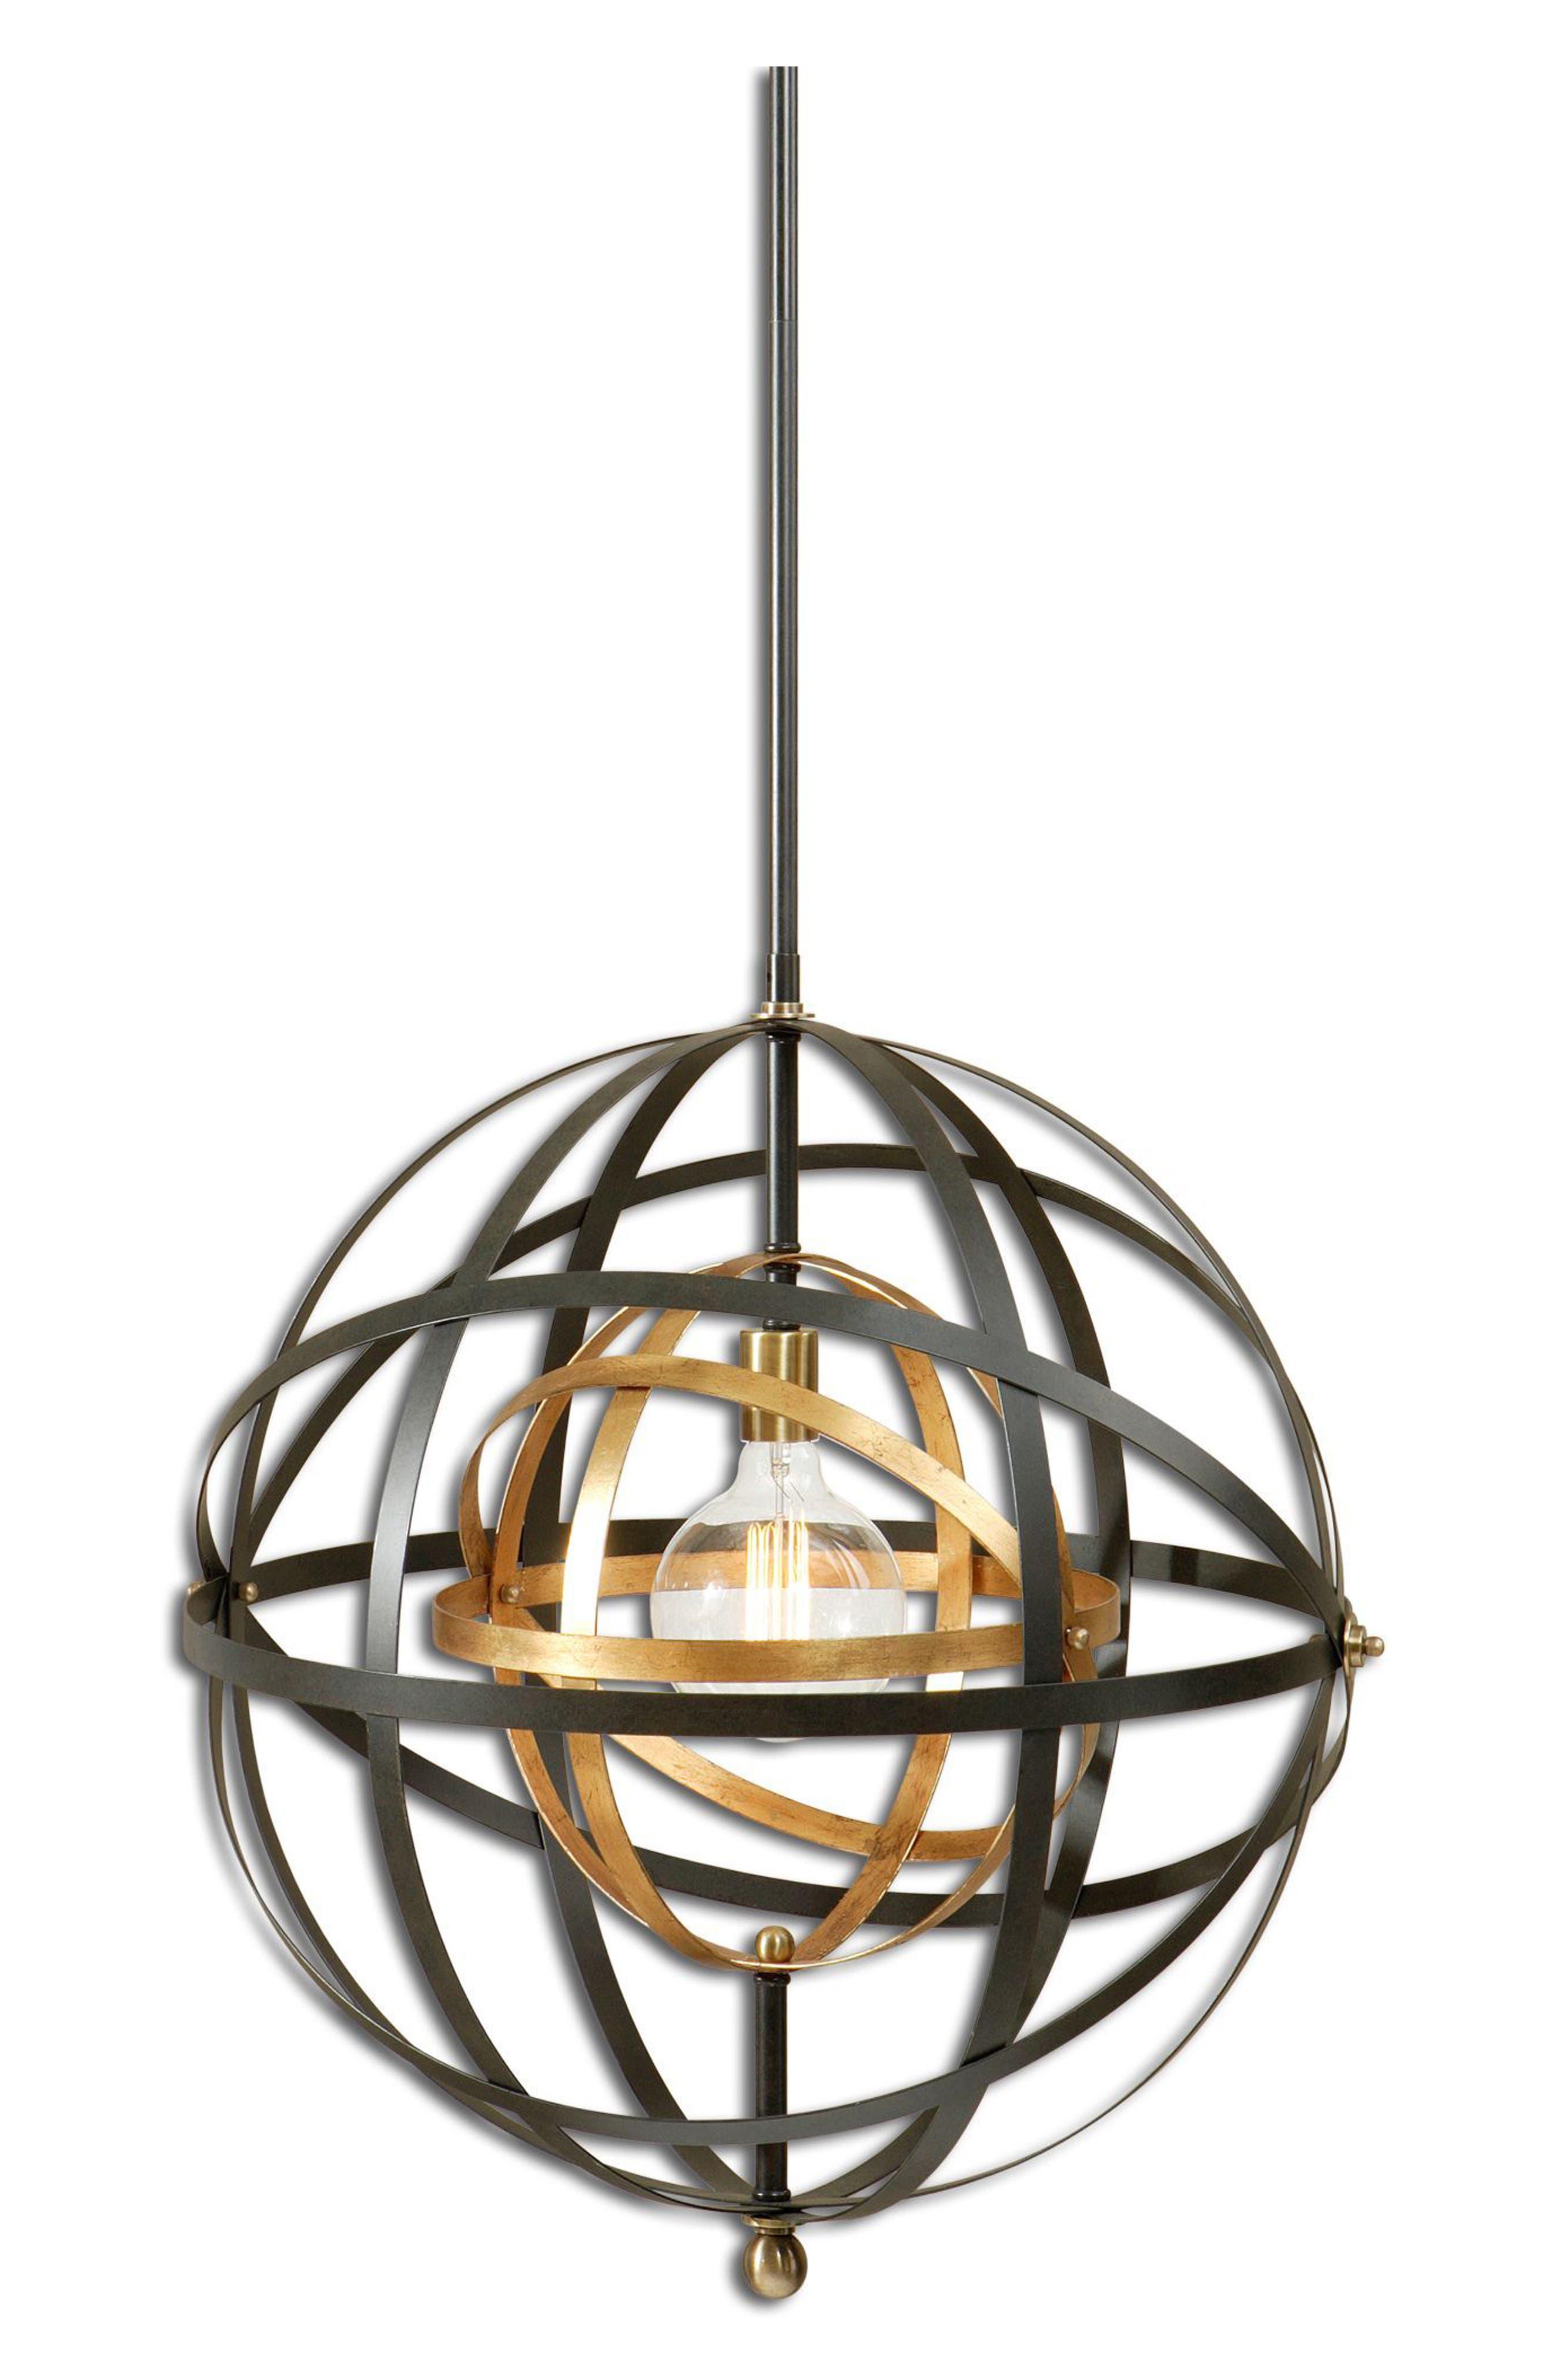 Rondure Pendant Light Fixture,                             Main thumbnail 1, color,                             Metallic Rust/ Copper